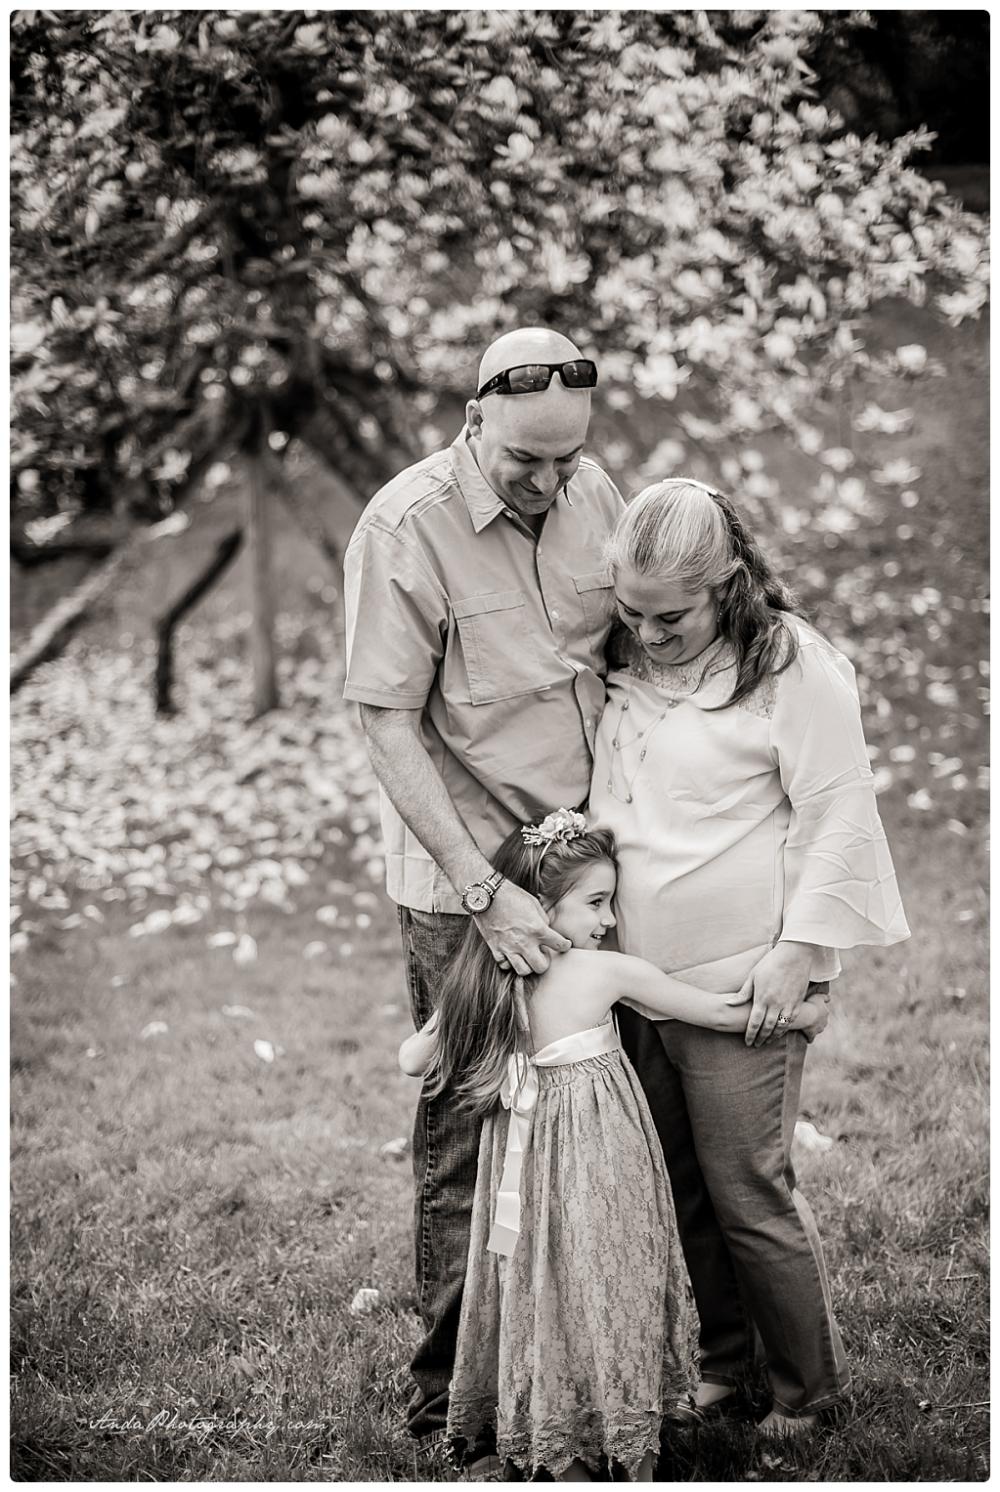 Anda Photography Bellingham family photography Bellingham family photographer bellingahm lifestyle photography woodstock farm photos_0001